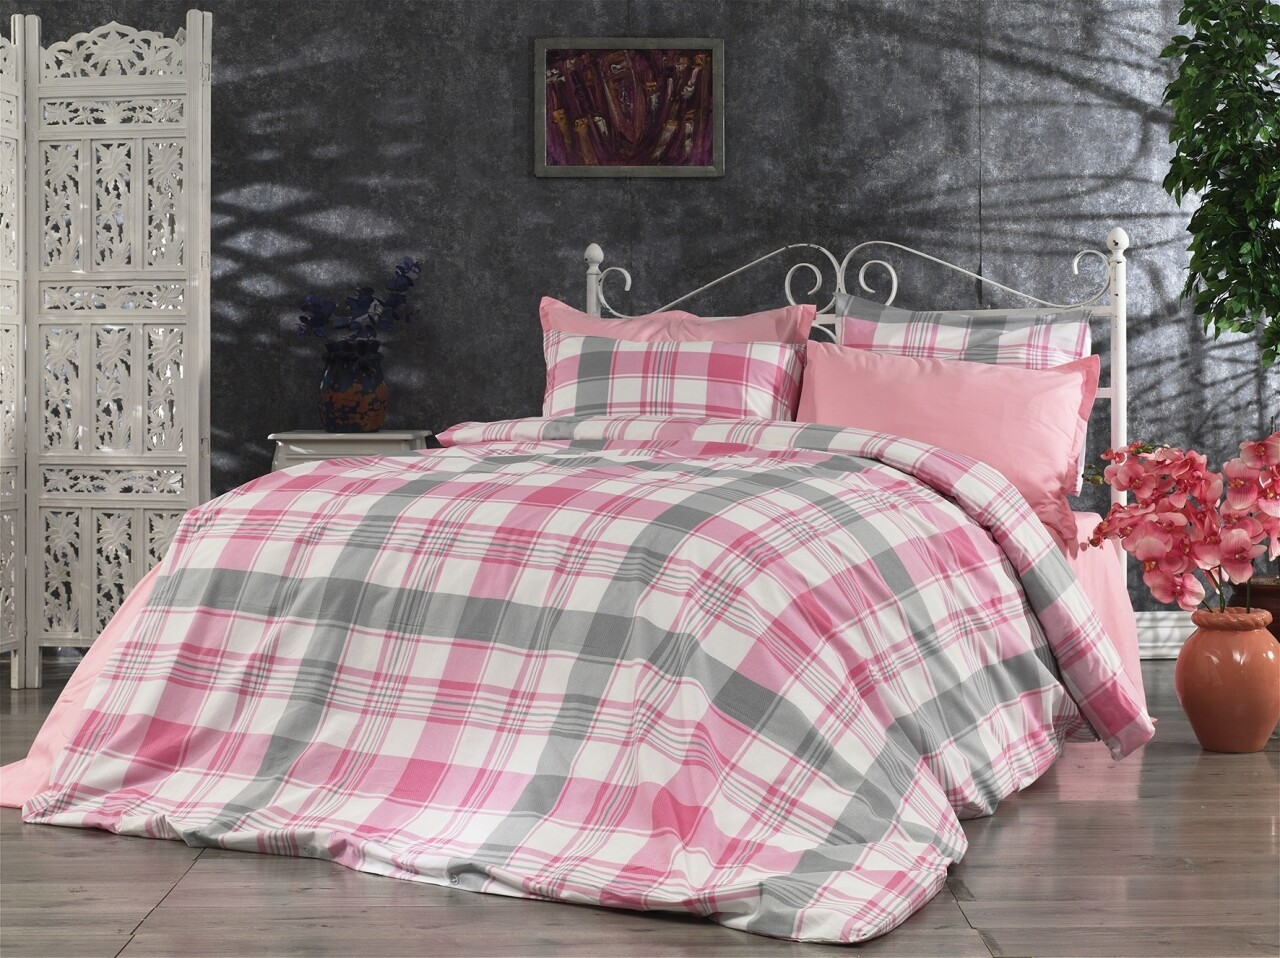 Lenjerie de pat pentru doua persoane Melange Rose Bedora, Cotton Rich